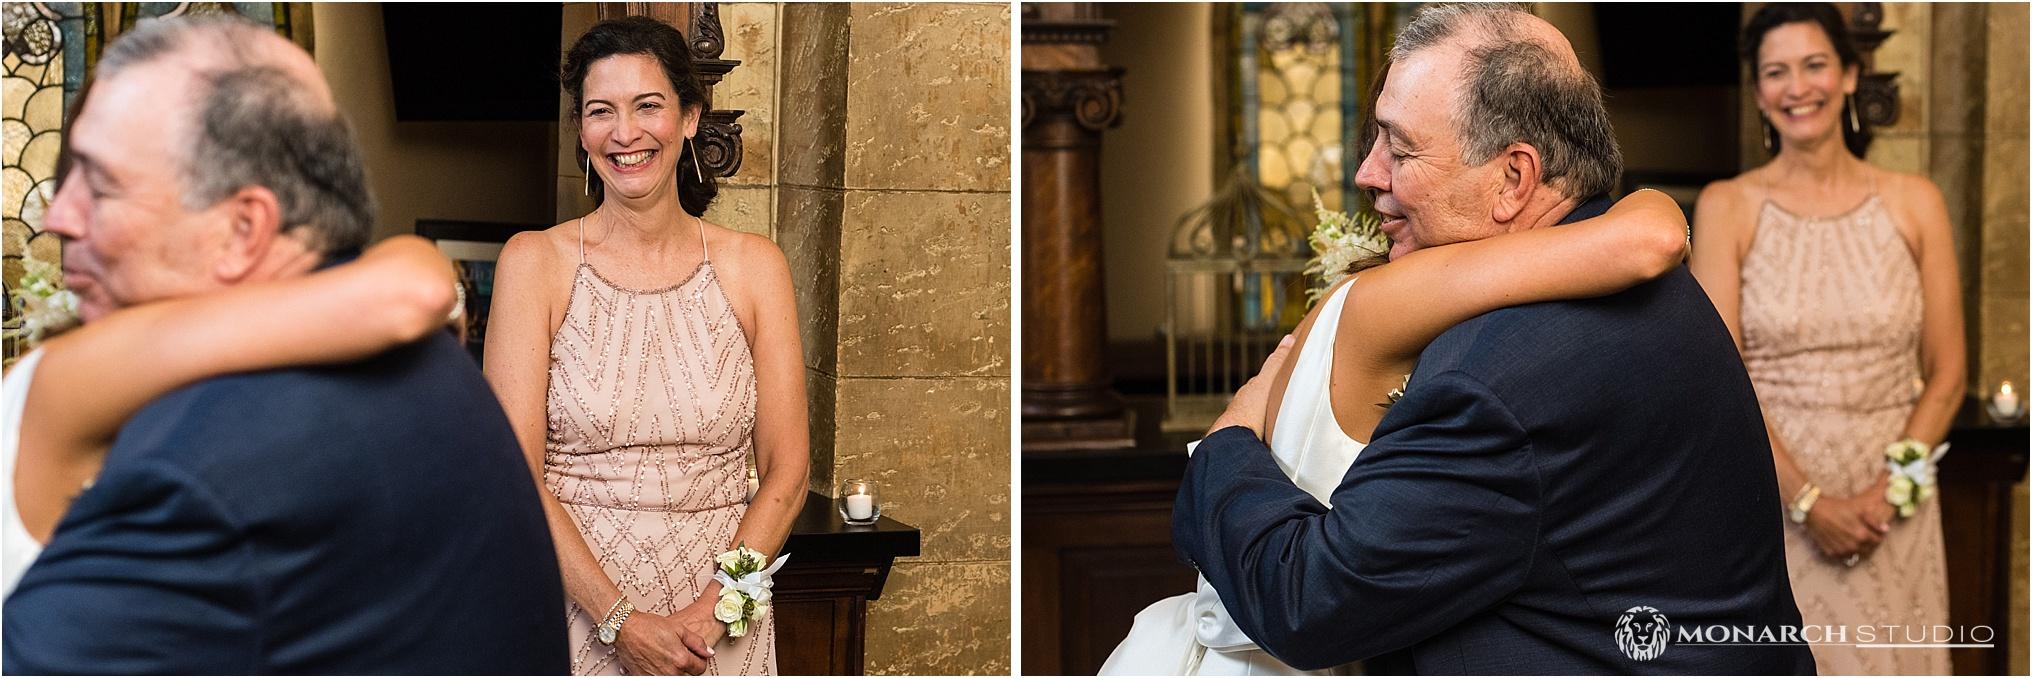 st-augustine-wedding-photographer-025.jpg